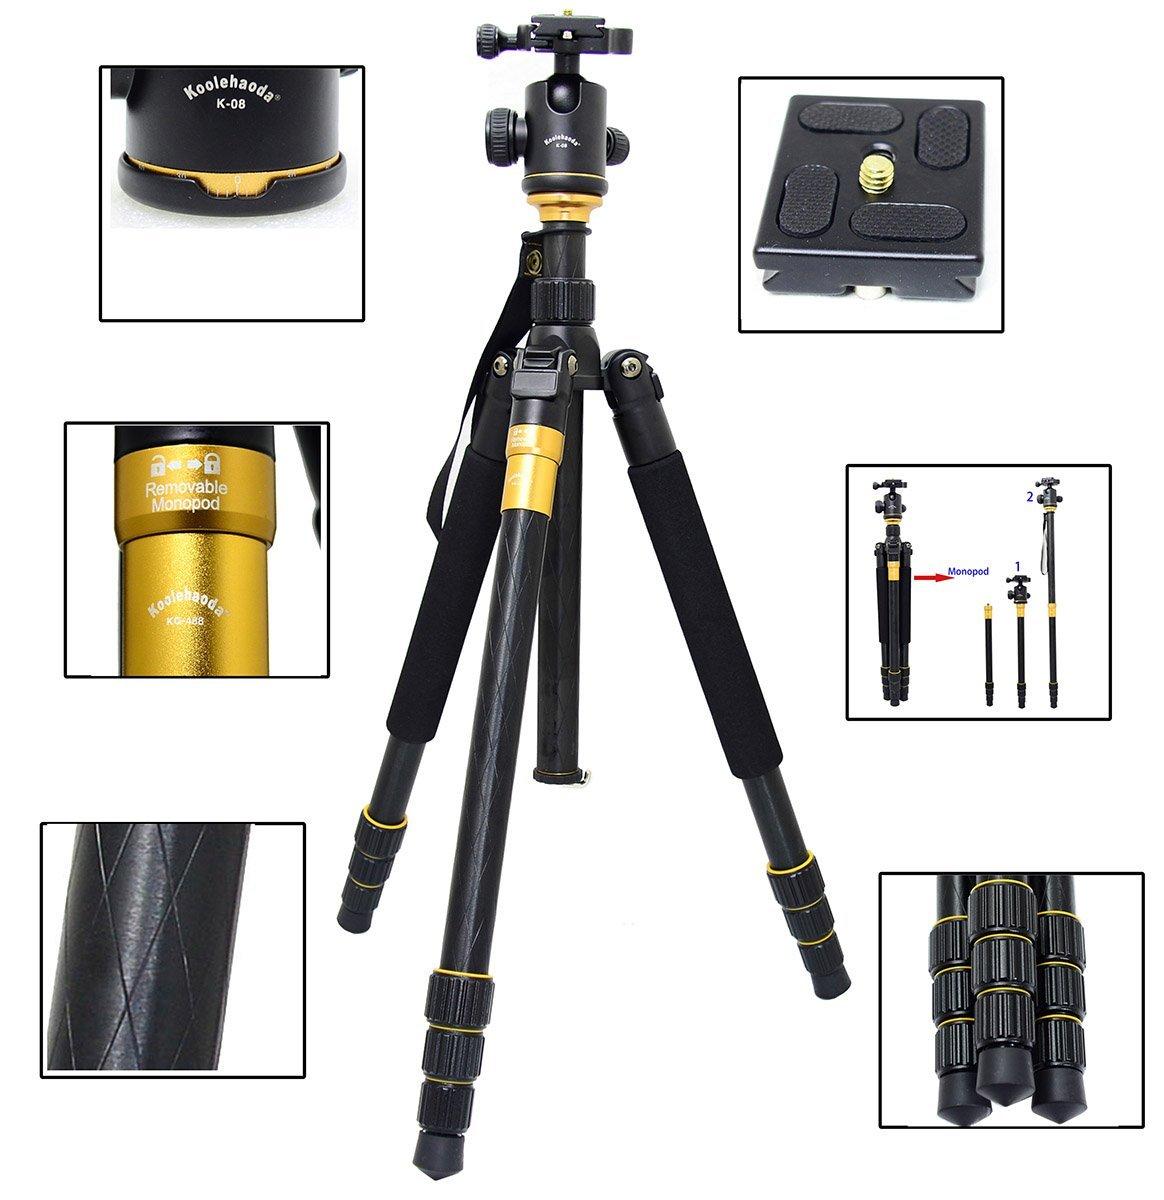 "Koolehaoda Q-999 SLR Camera Tripod Monopod & Ball Head Portable Compact Travel. Tripod Max Height: 1590mm (62.5"")"